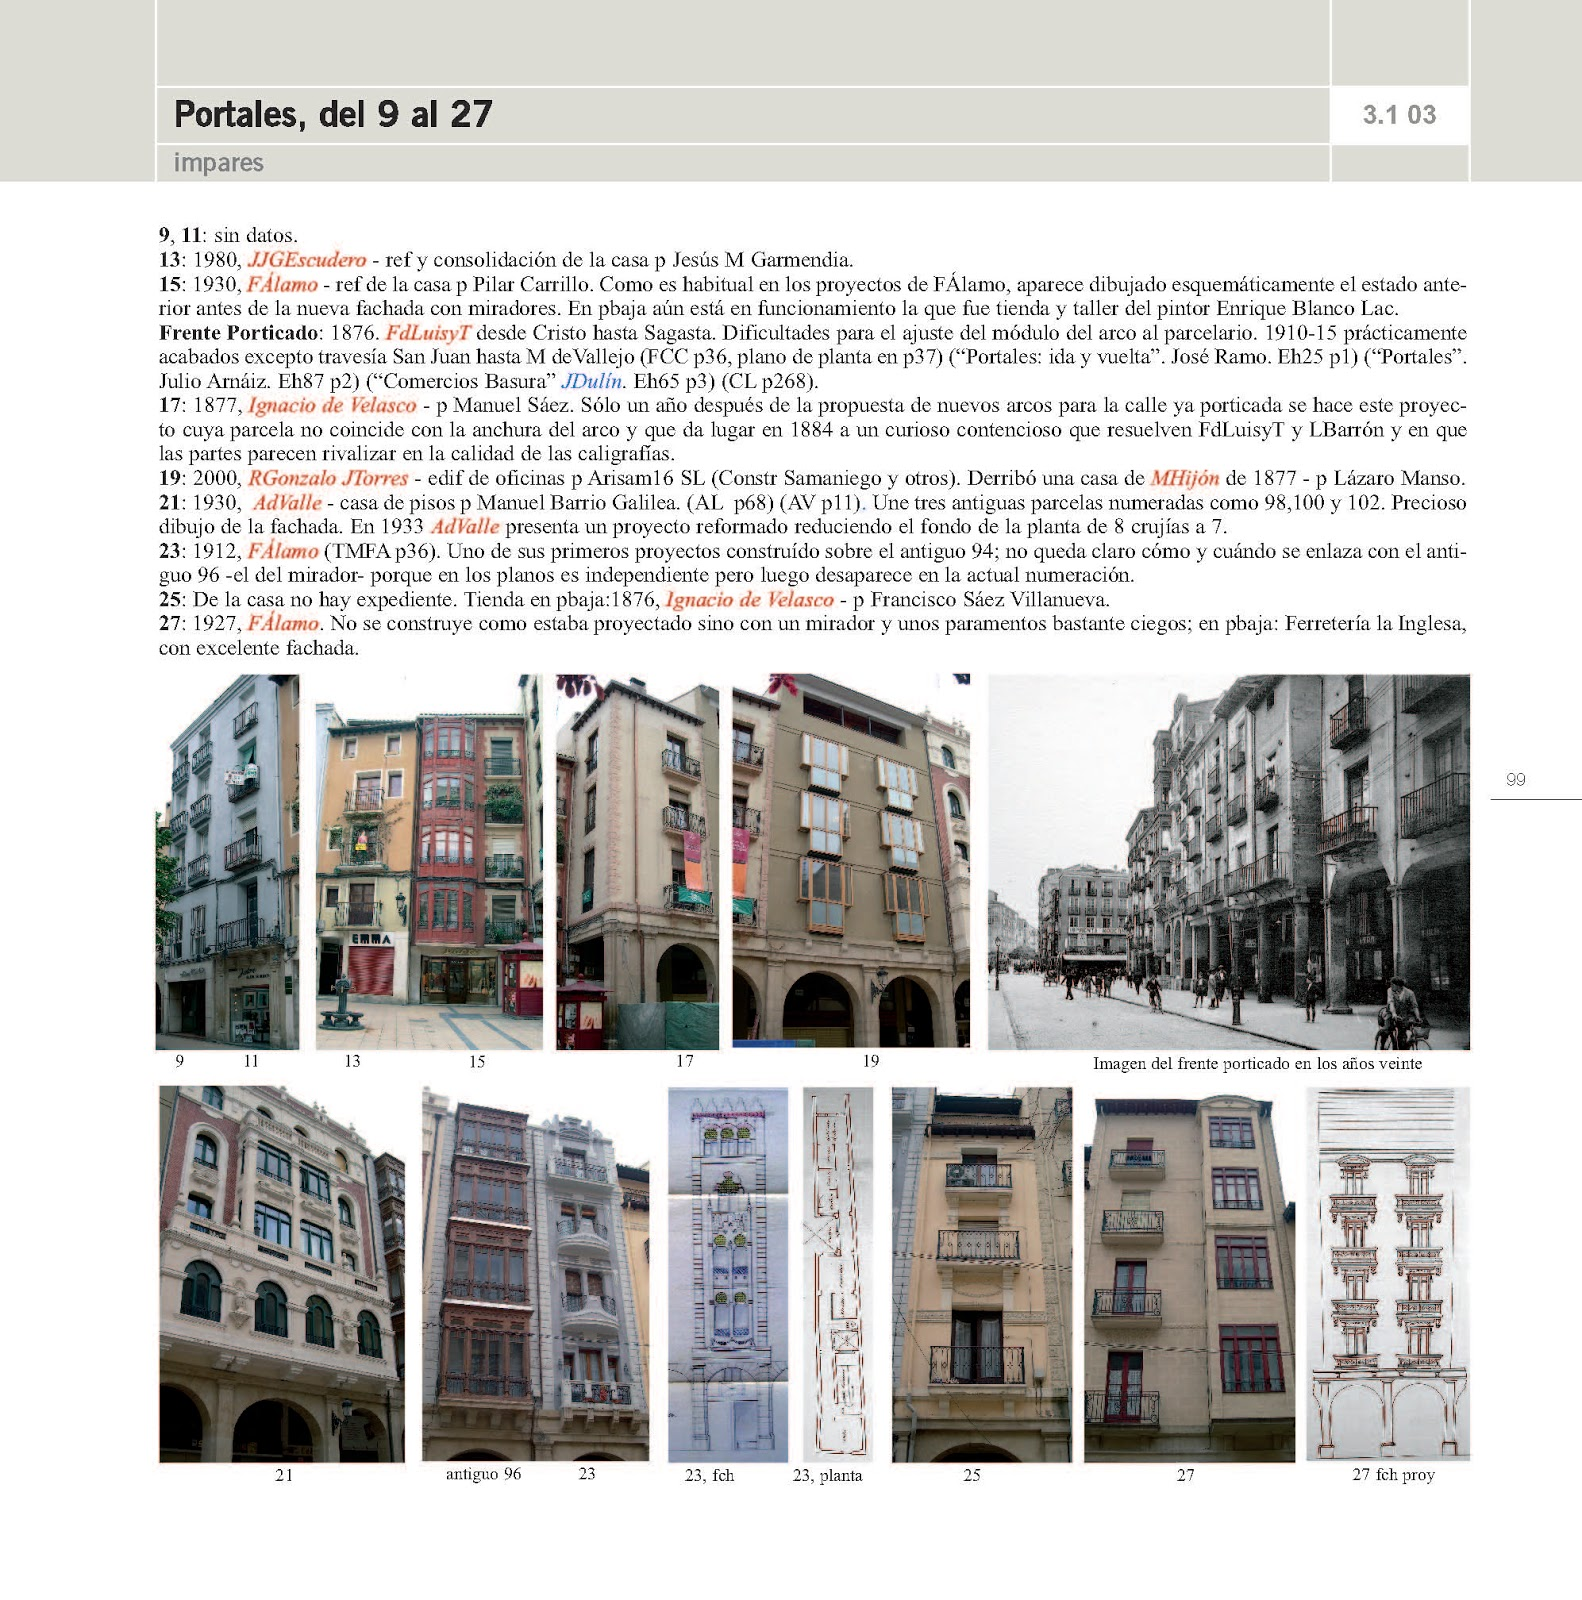 Guia de arquitectura de logro o paginas 3 1 03 portales for Paginas arquitectura